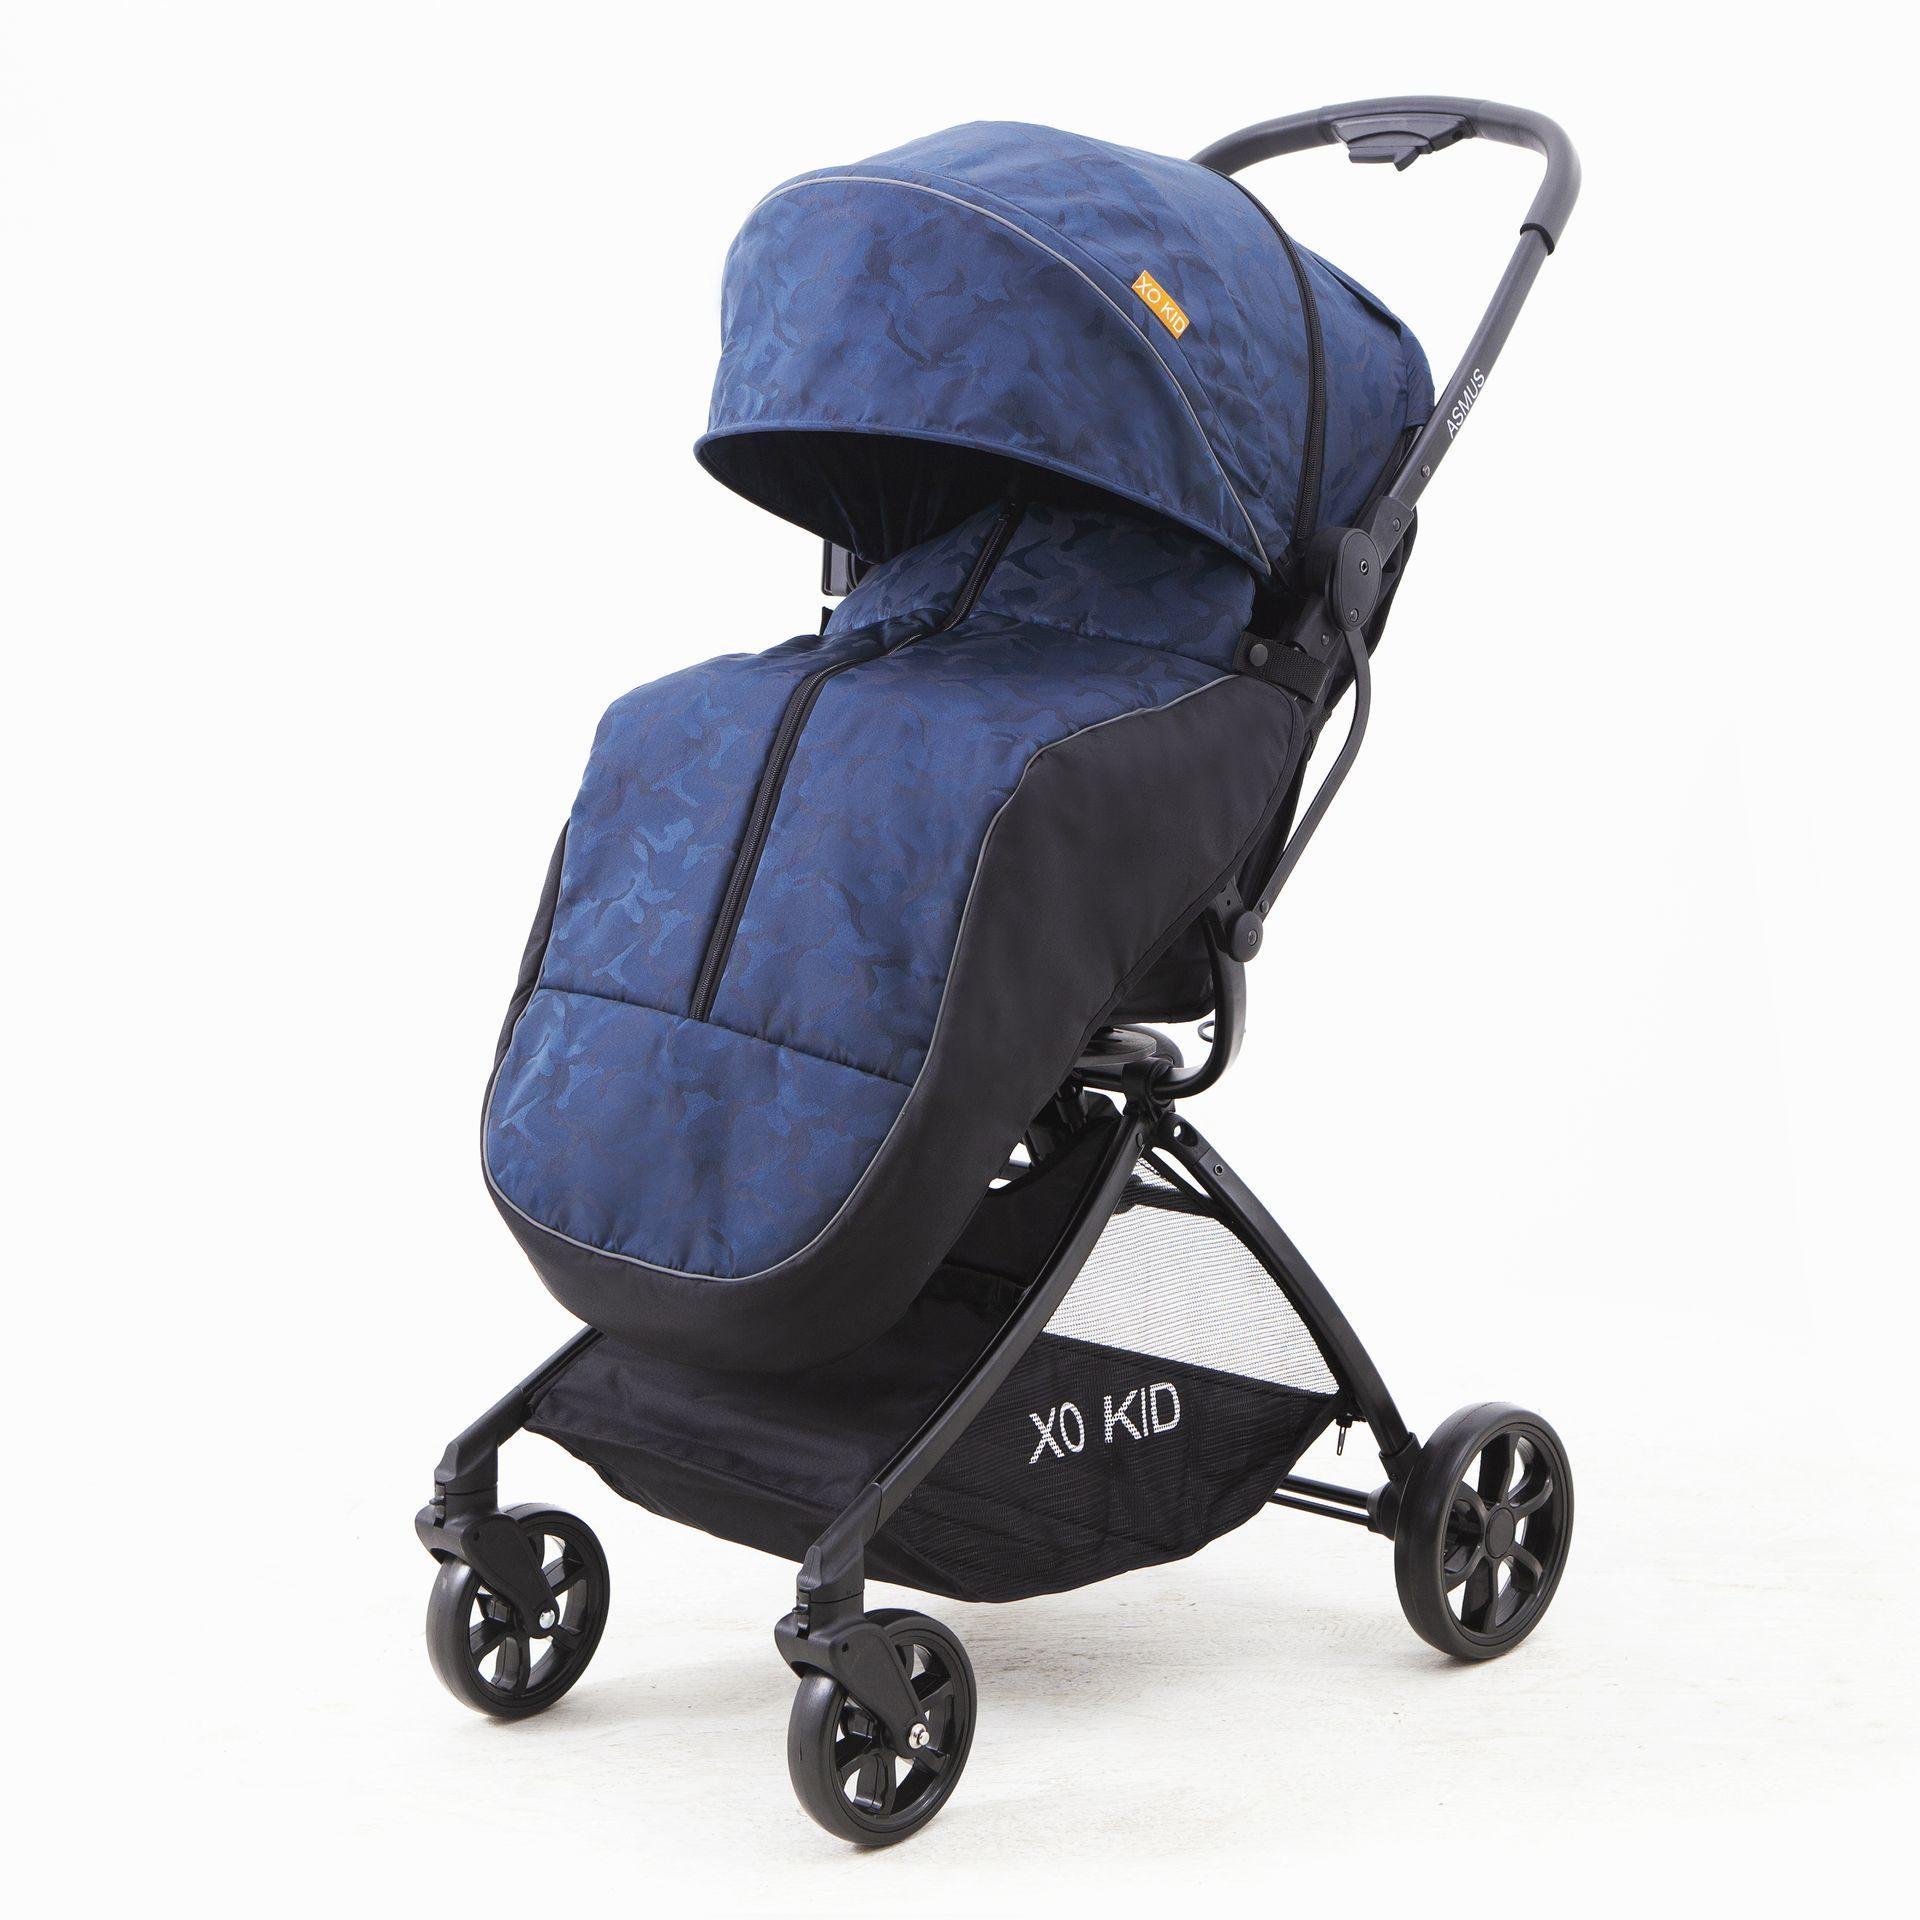 Коляска детская XO KID Asmus blue